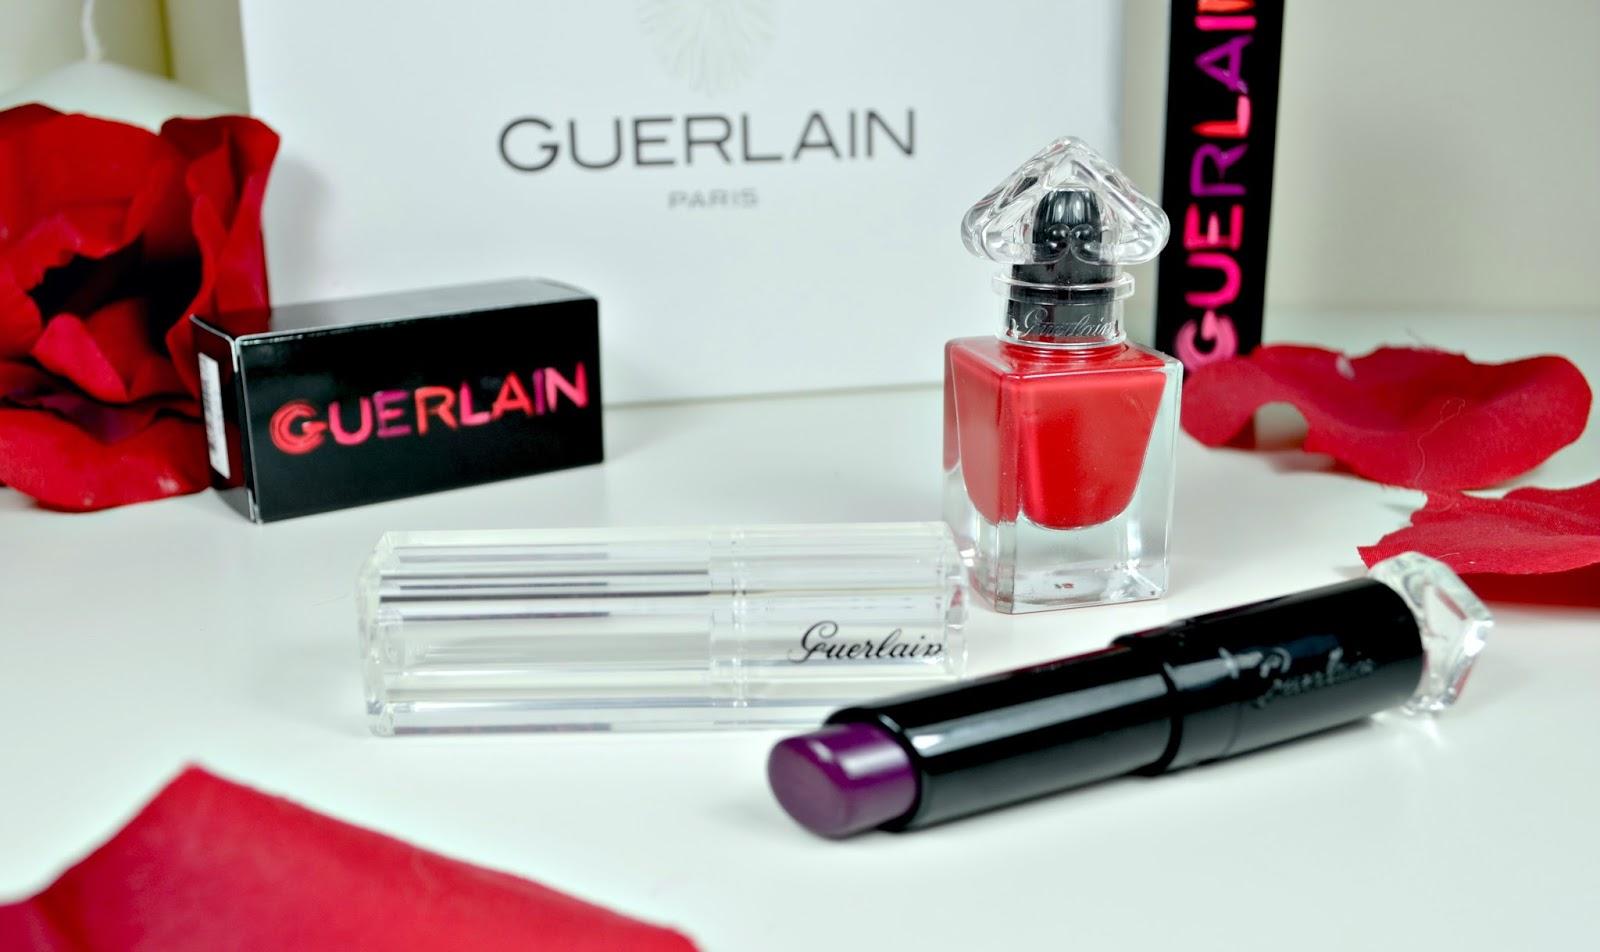 0e7cba74205 Guerlain - Spring 2016 range - La Petite Robe Niore - Lipstick - nail  varnish -